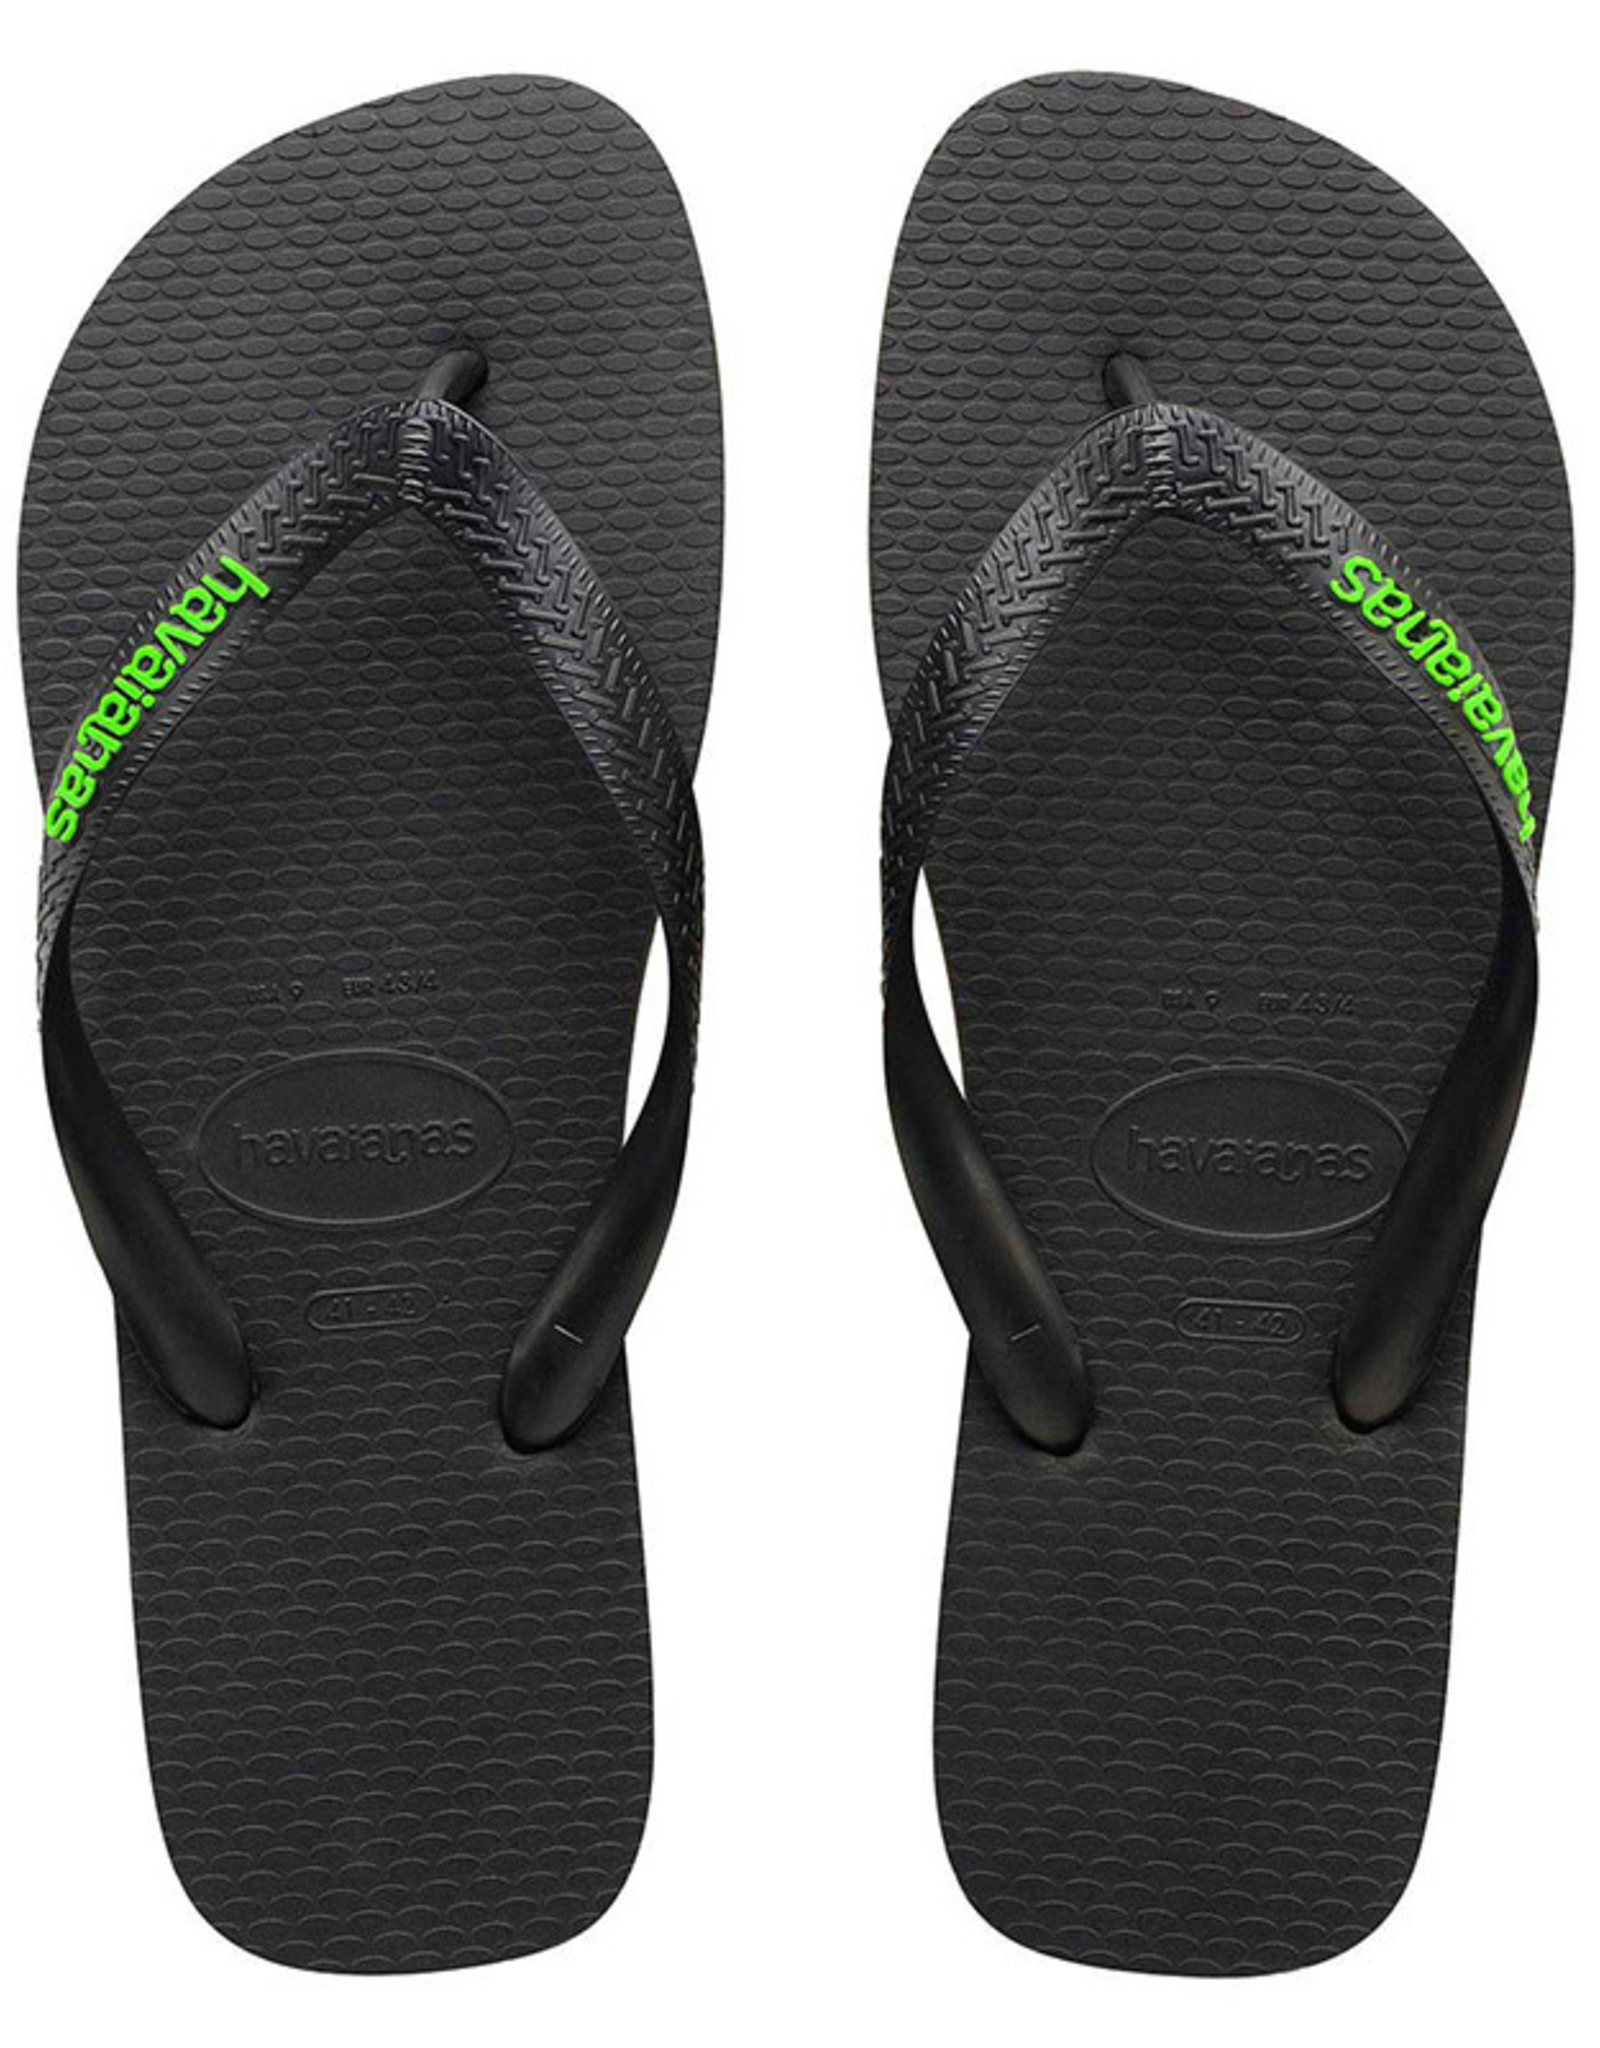 HAVAIANAS Rubber Logo Black/Neon Green Thongs